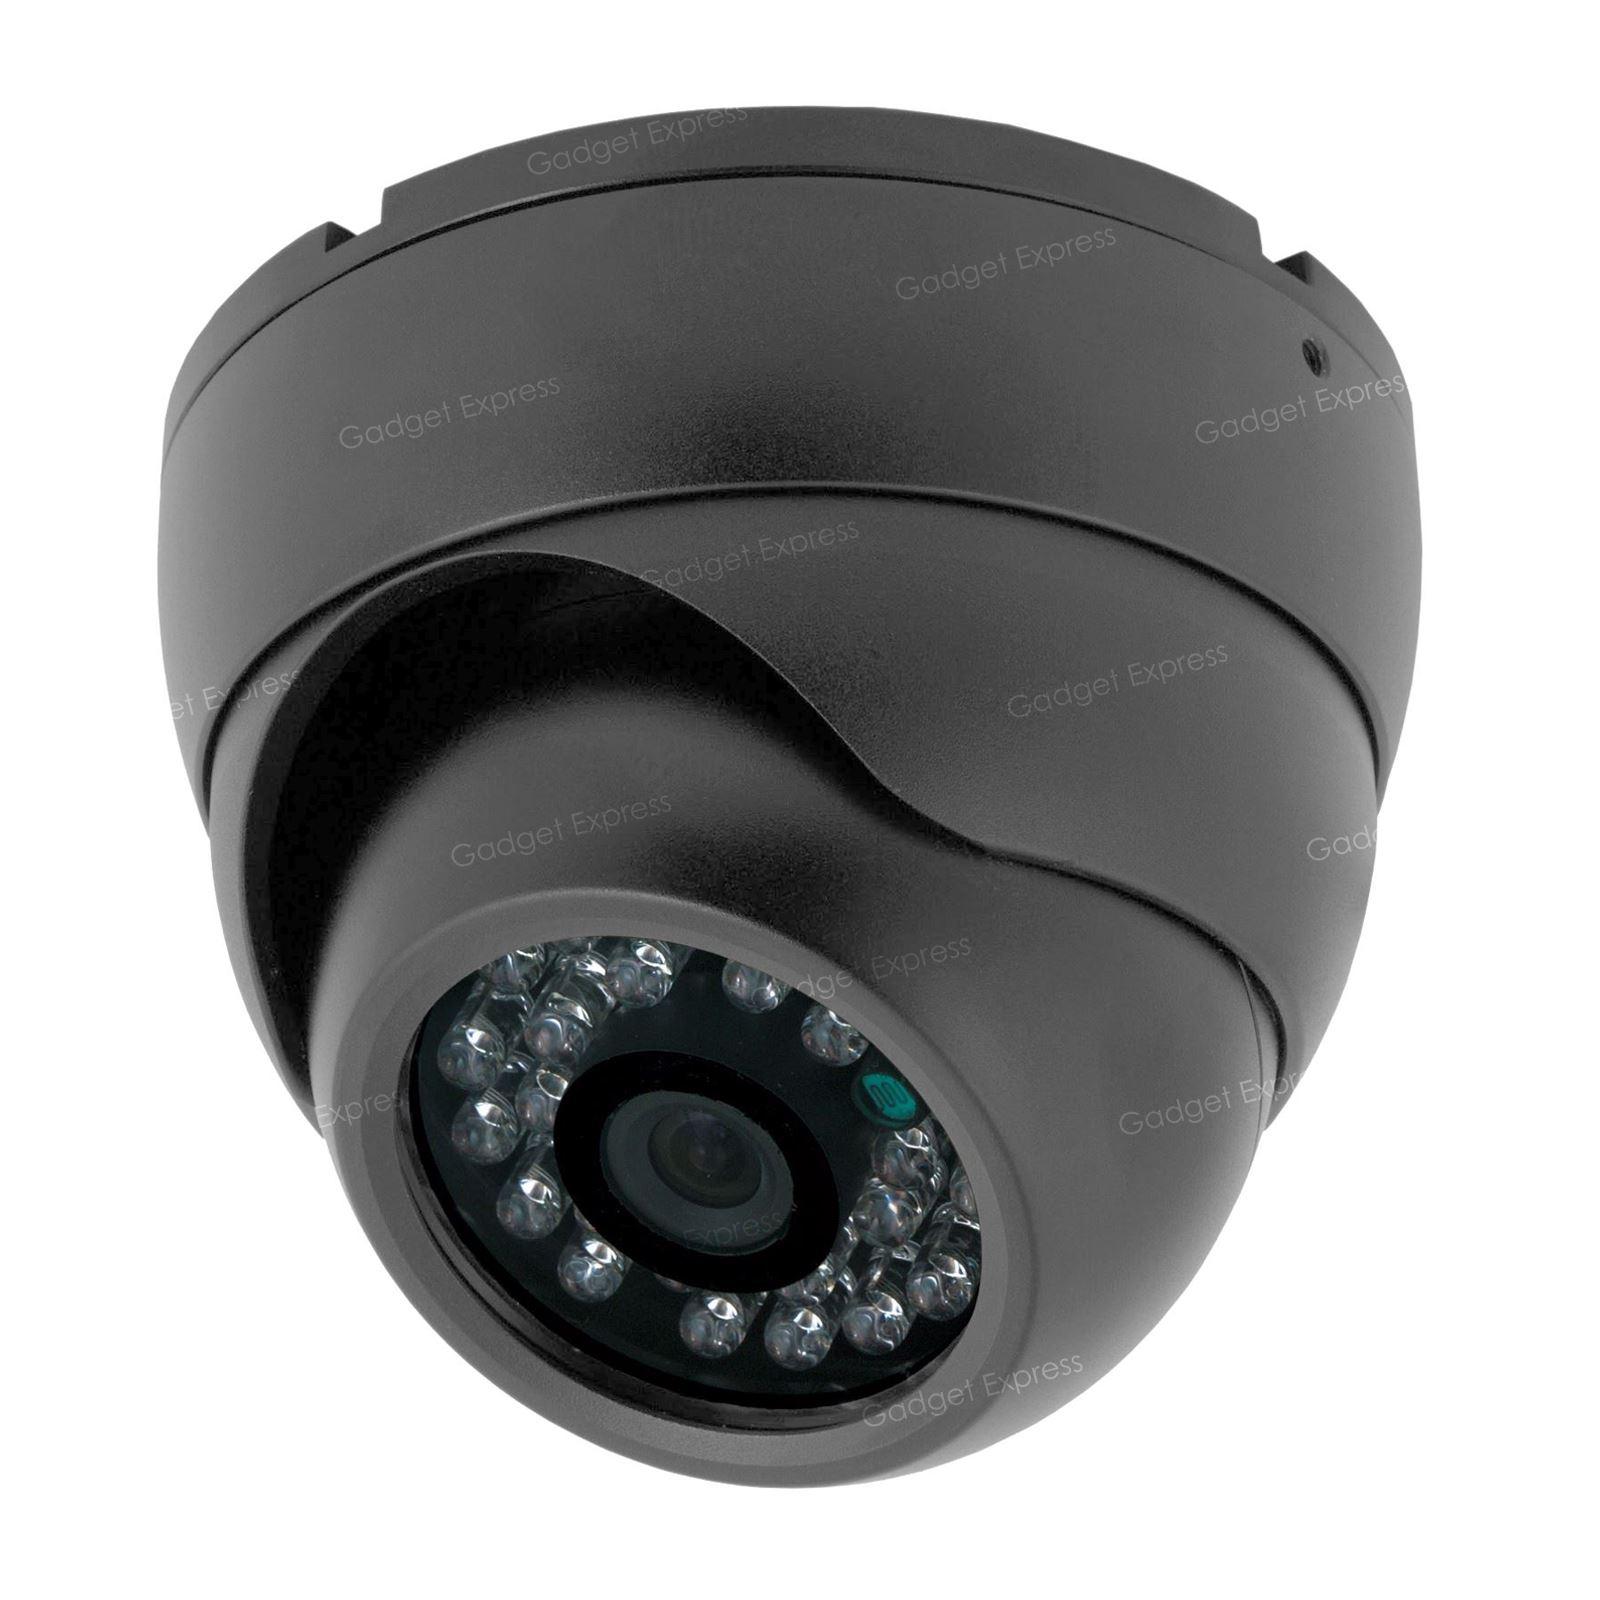 Indoor Outdoor 700tvl 1 3 Sony Ccd Night Ir Dome Security Cctv Camera Ebay